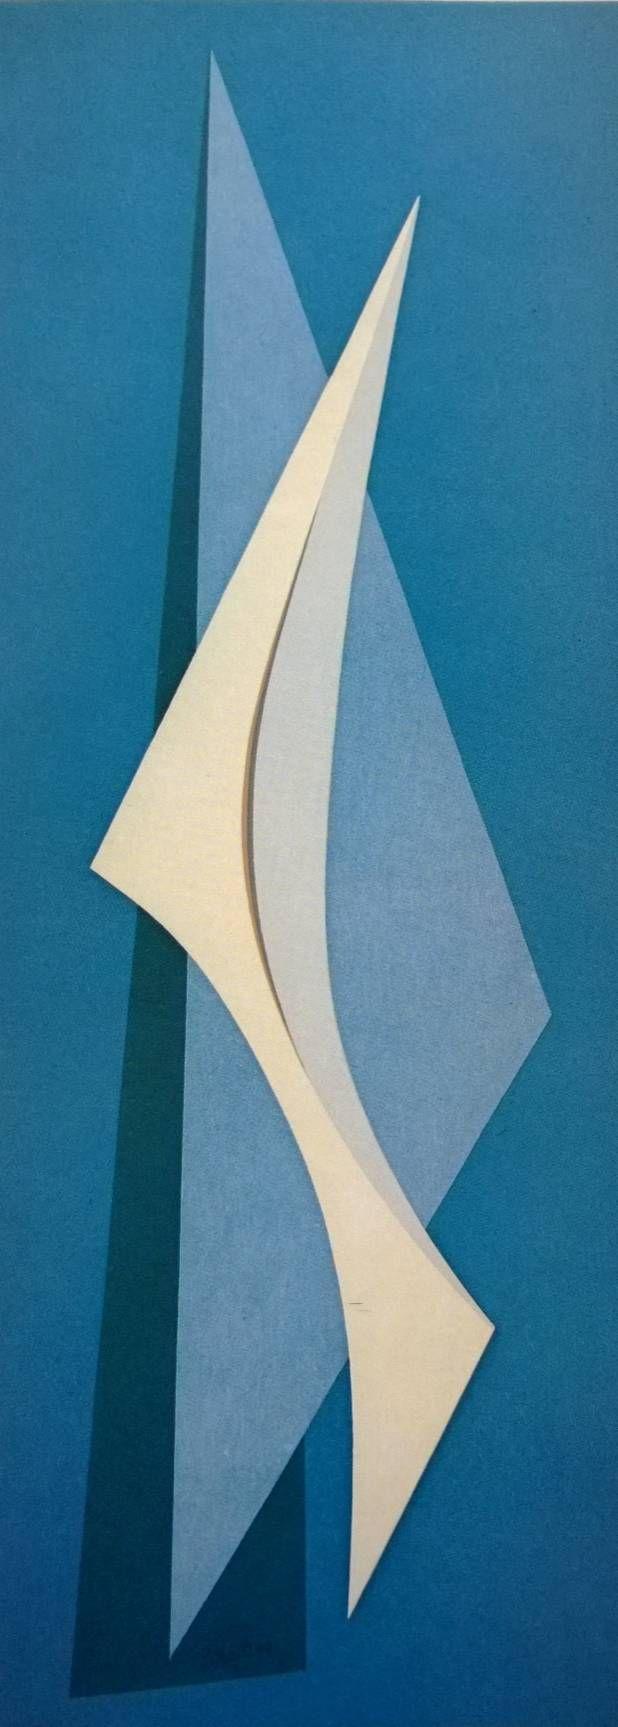 White bird, 1959. Emilio Pettoruti, Argentinian painter. L'oiseau blanc,1959. Oil 145x57cm. Buenos Aires, Argentina.